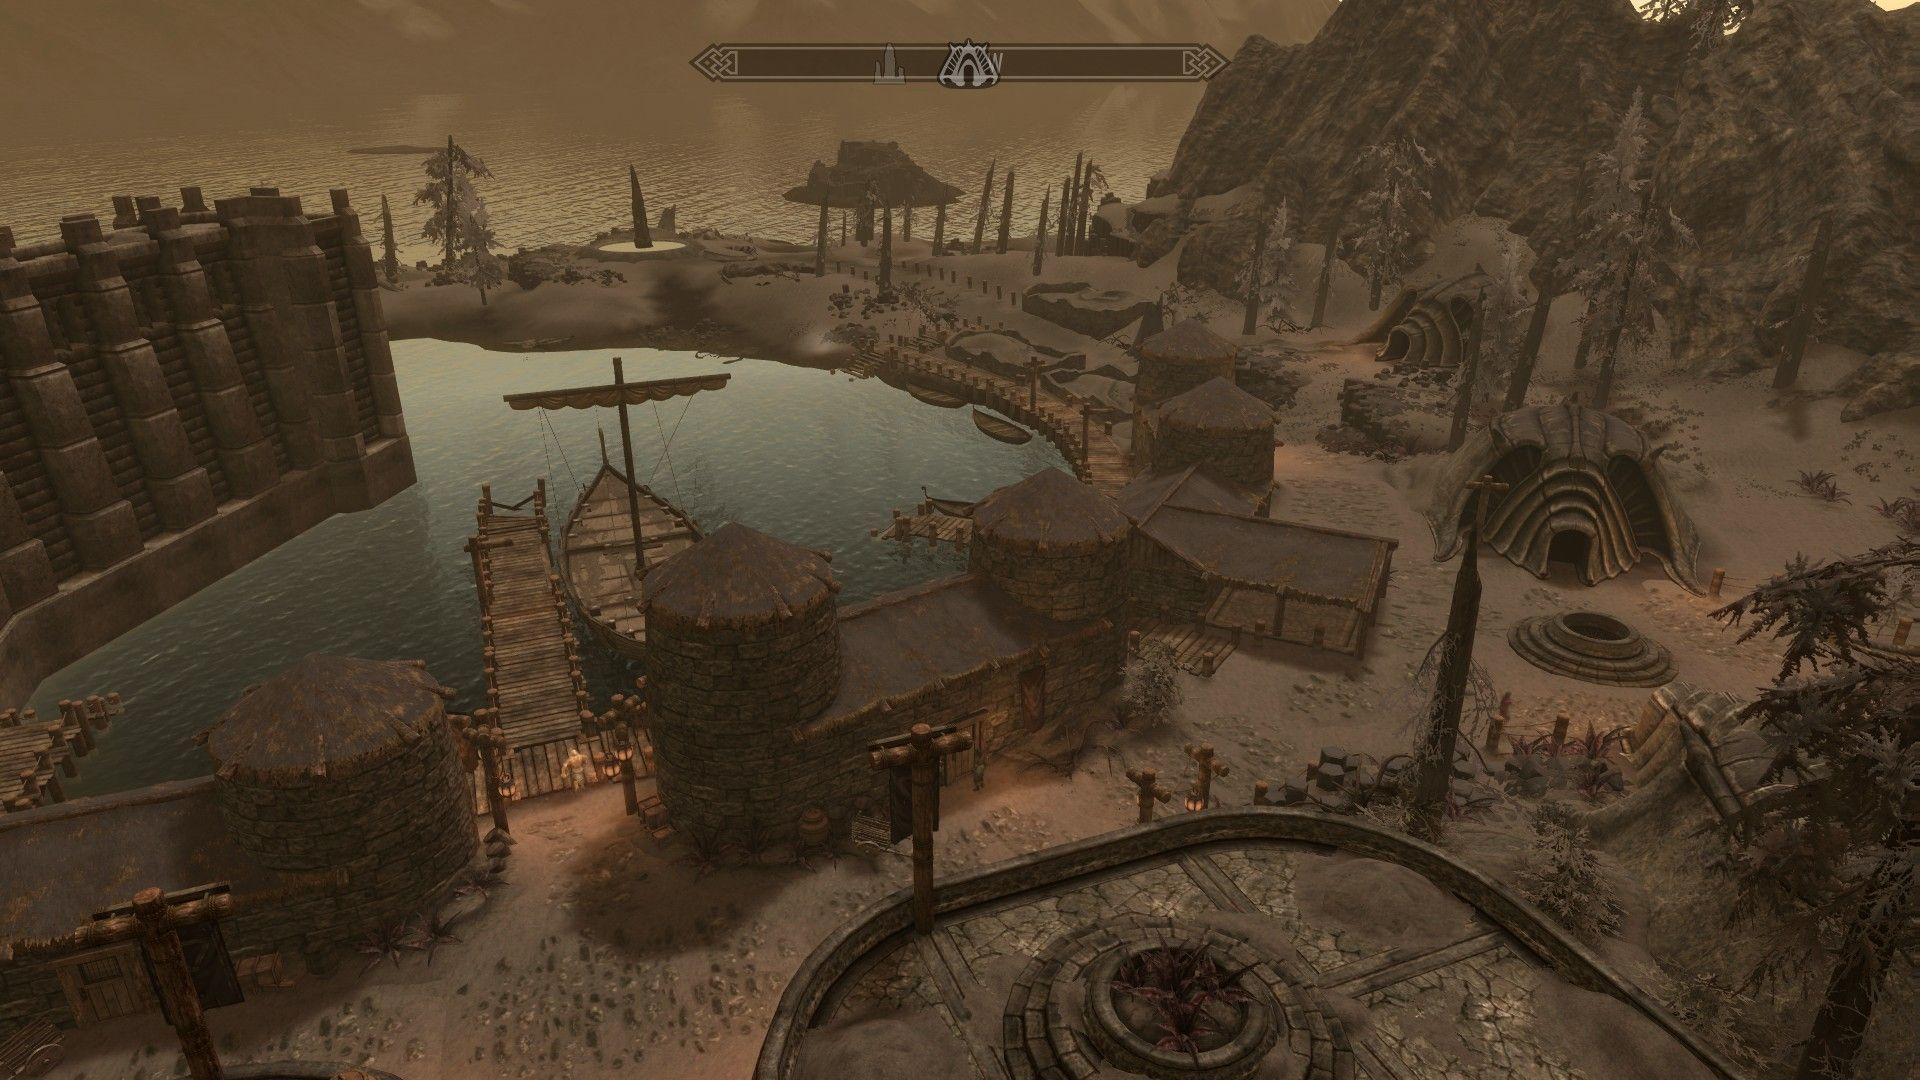 Embla Ysmir Ericsdotter touring Solstheim Morrowind    Elder